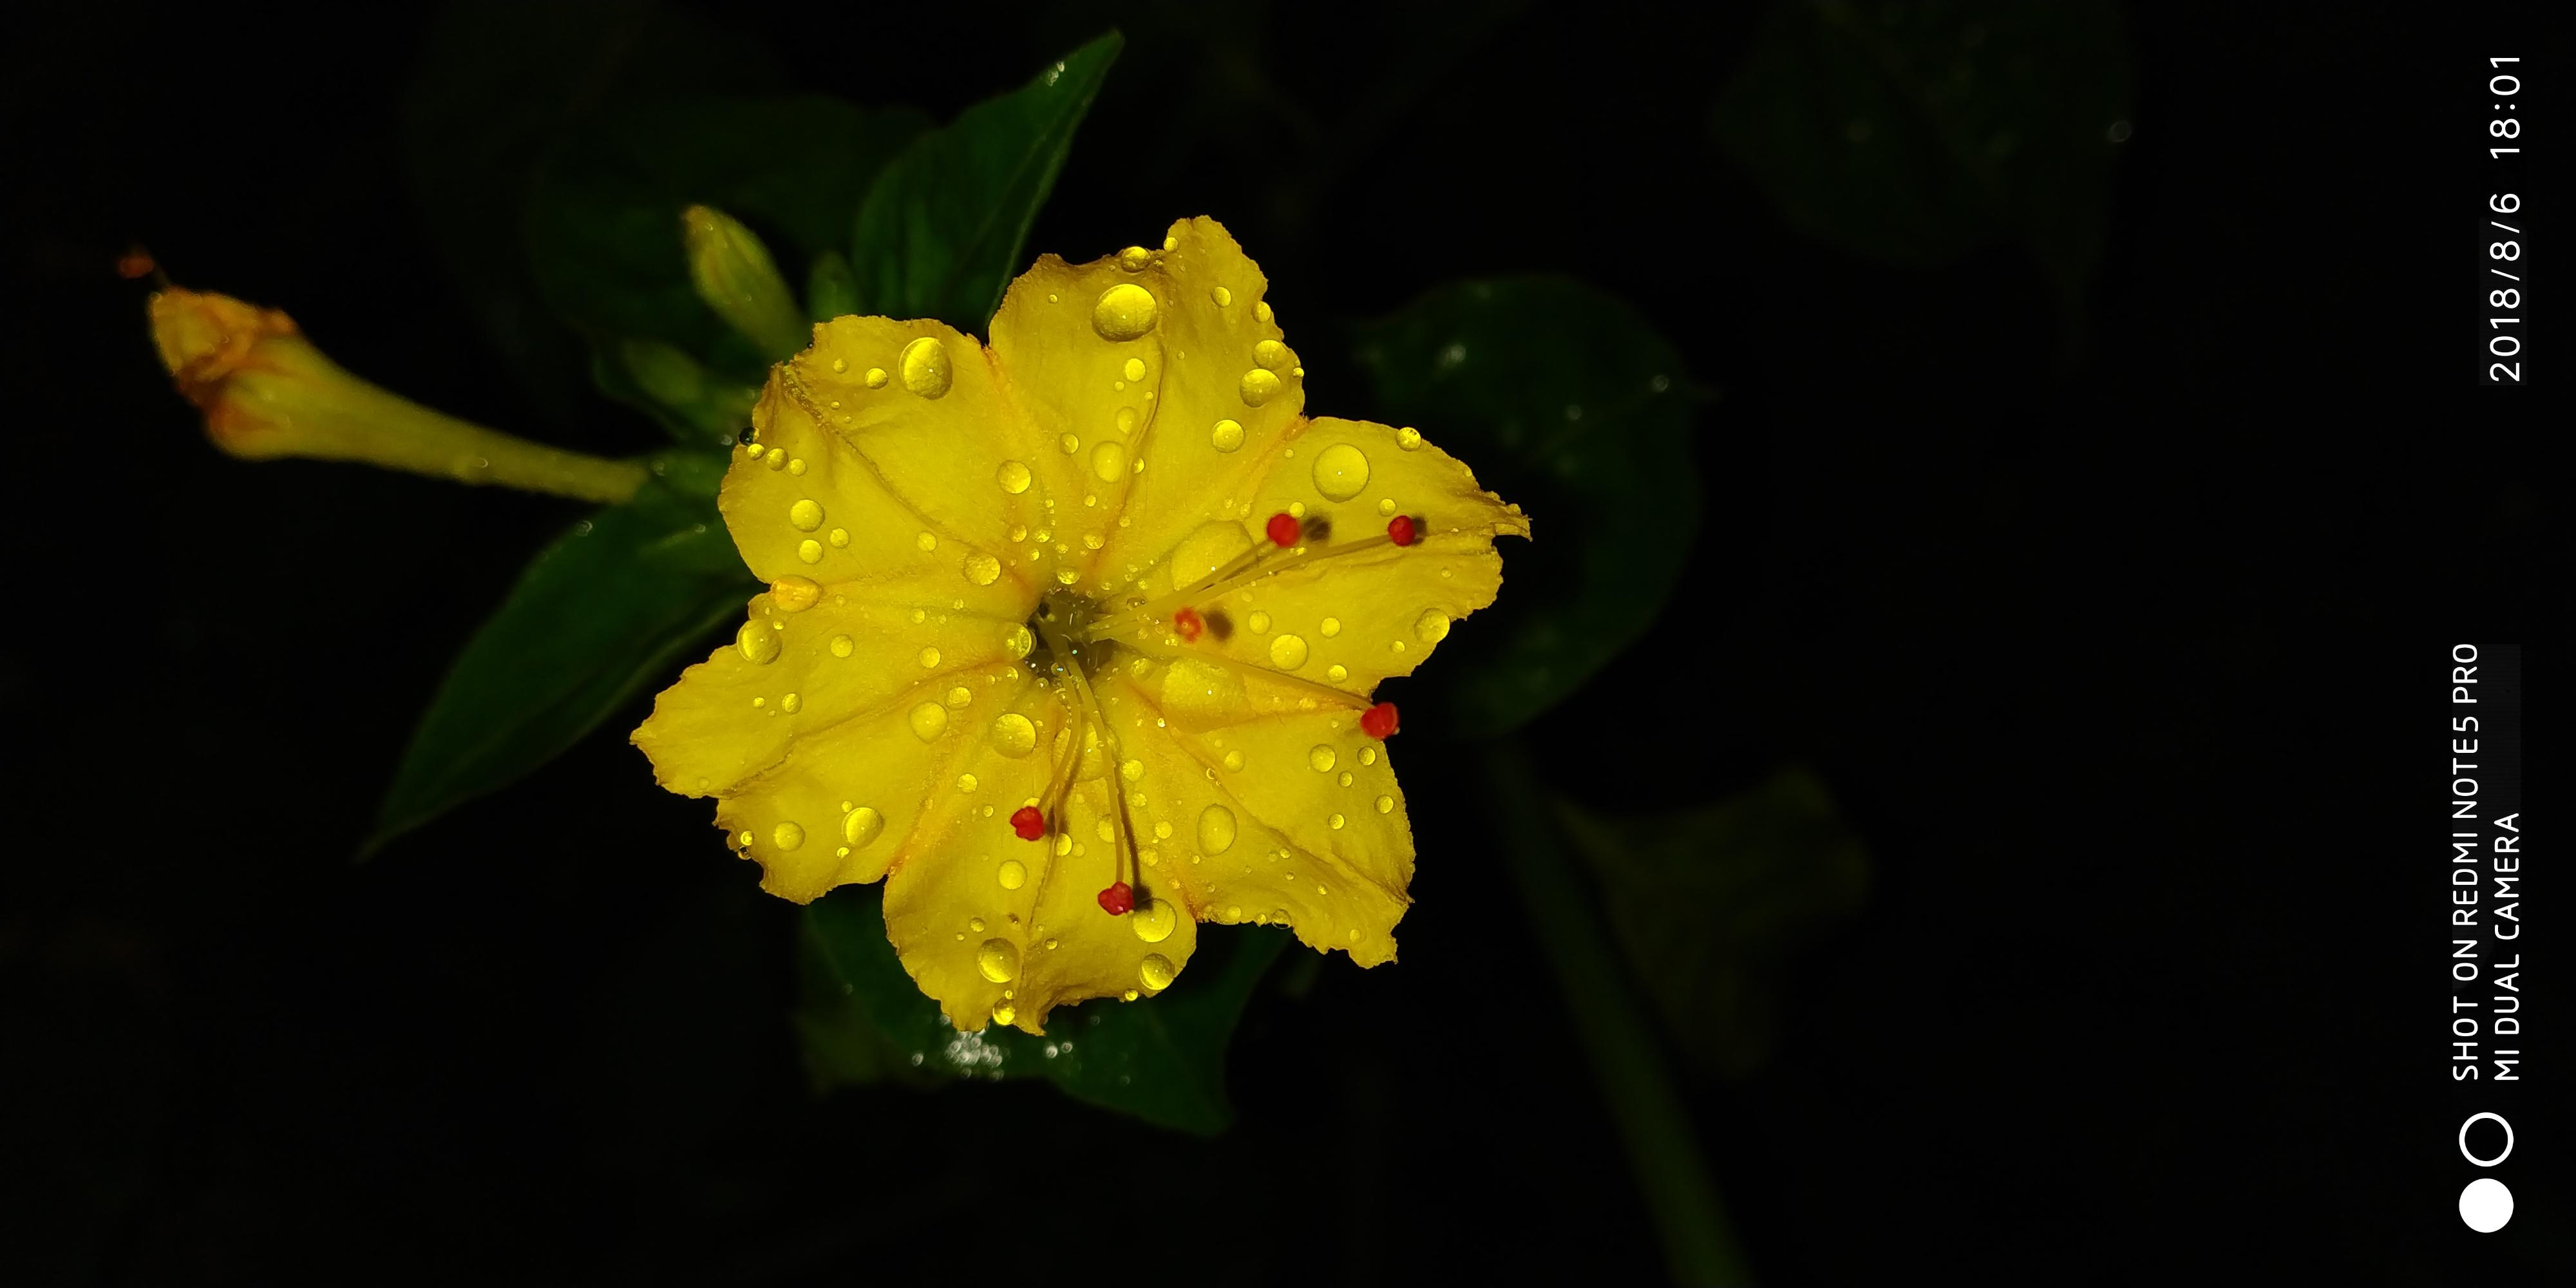 Night beauty of lily flower in rainy season photography mi night beauty of lily flower in rainy season izmirmasajfo